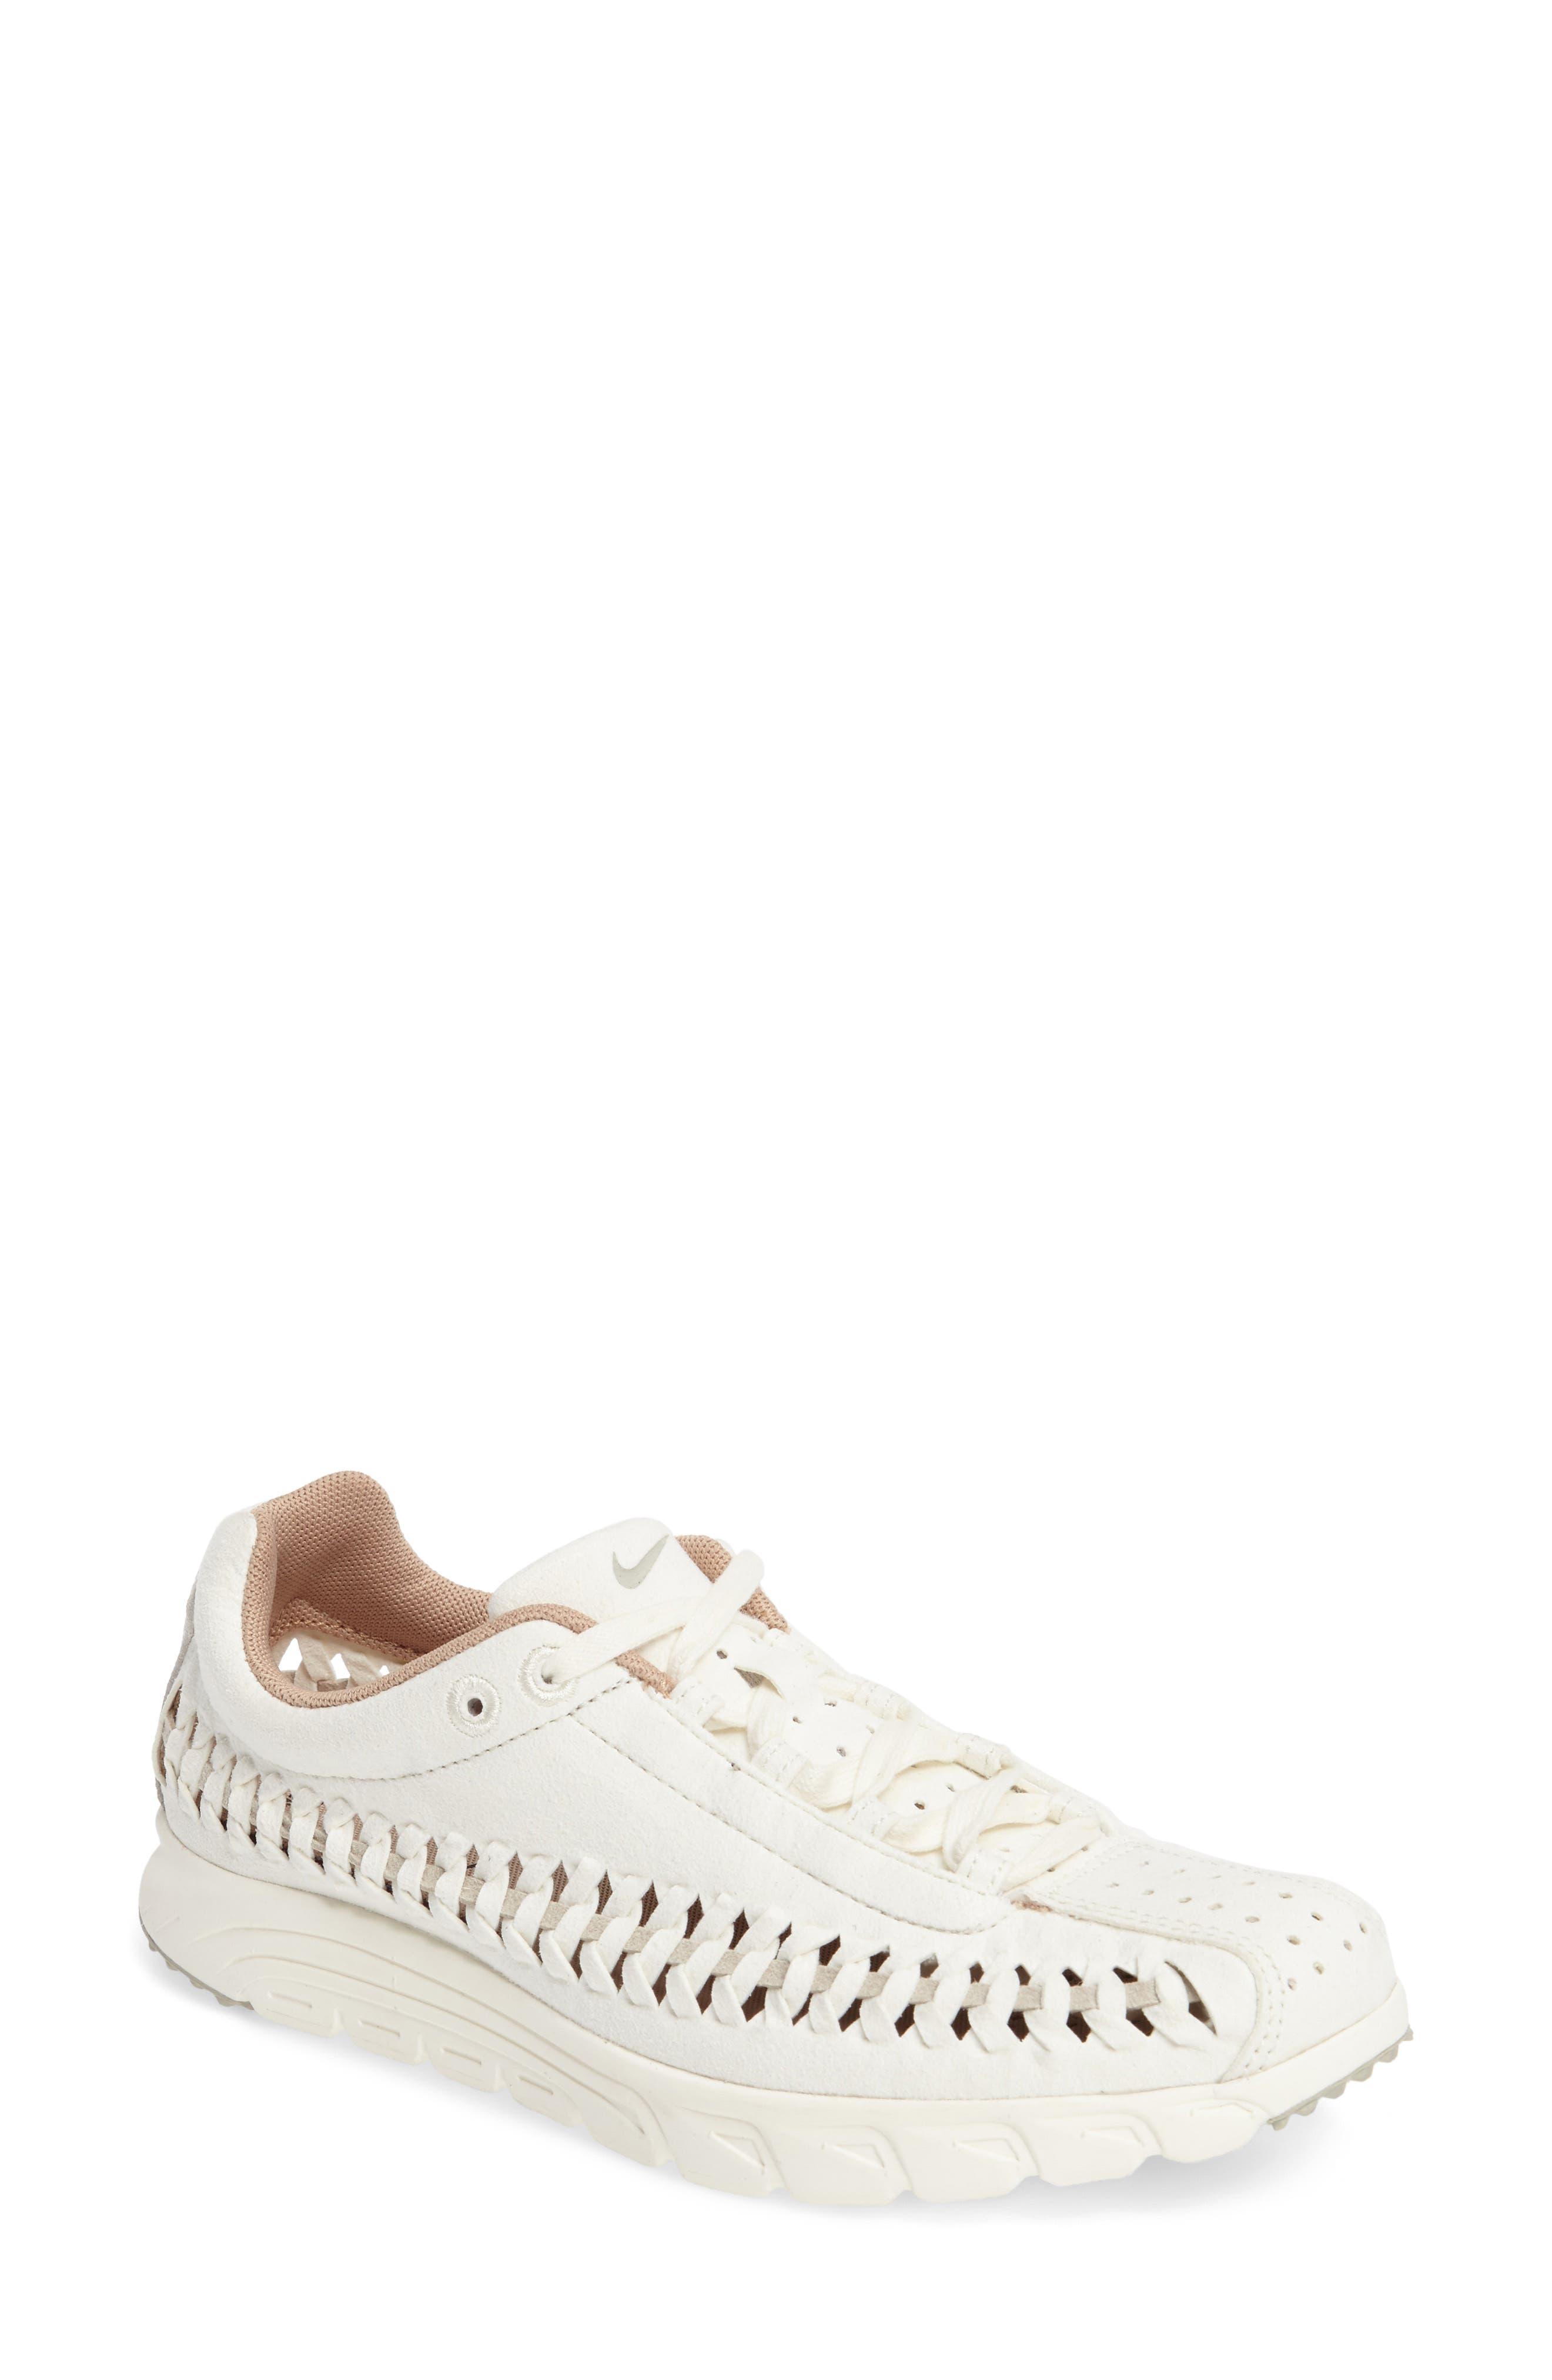 'Mayfly Woven' Sneaker,                             Main thumbnail 1, color,                             Sail/ Pale Grey/ Elm/ Sail